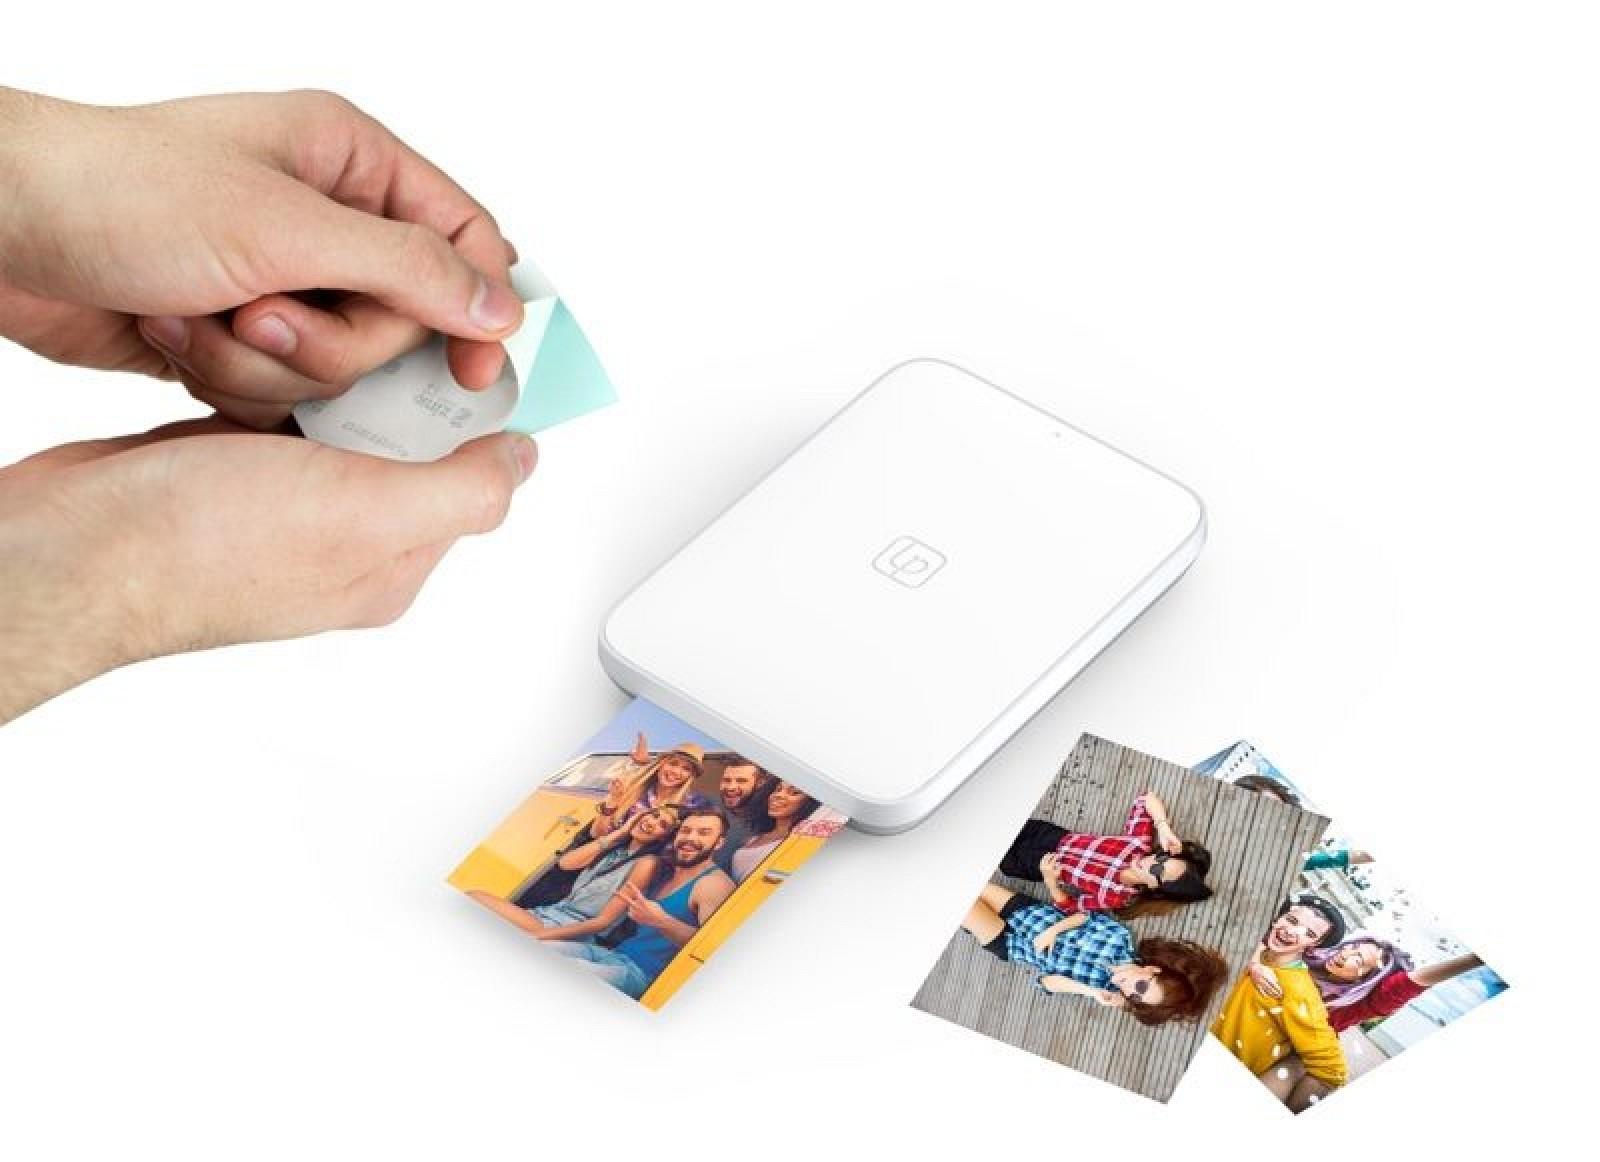 Lifeprint 3x4 5 Photo And Video Printer Review Macrumors